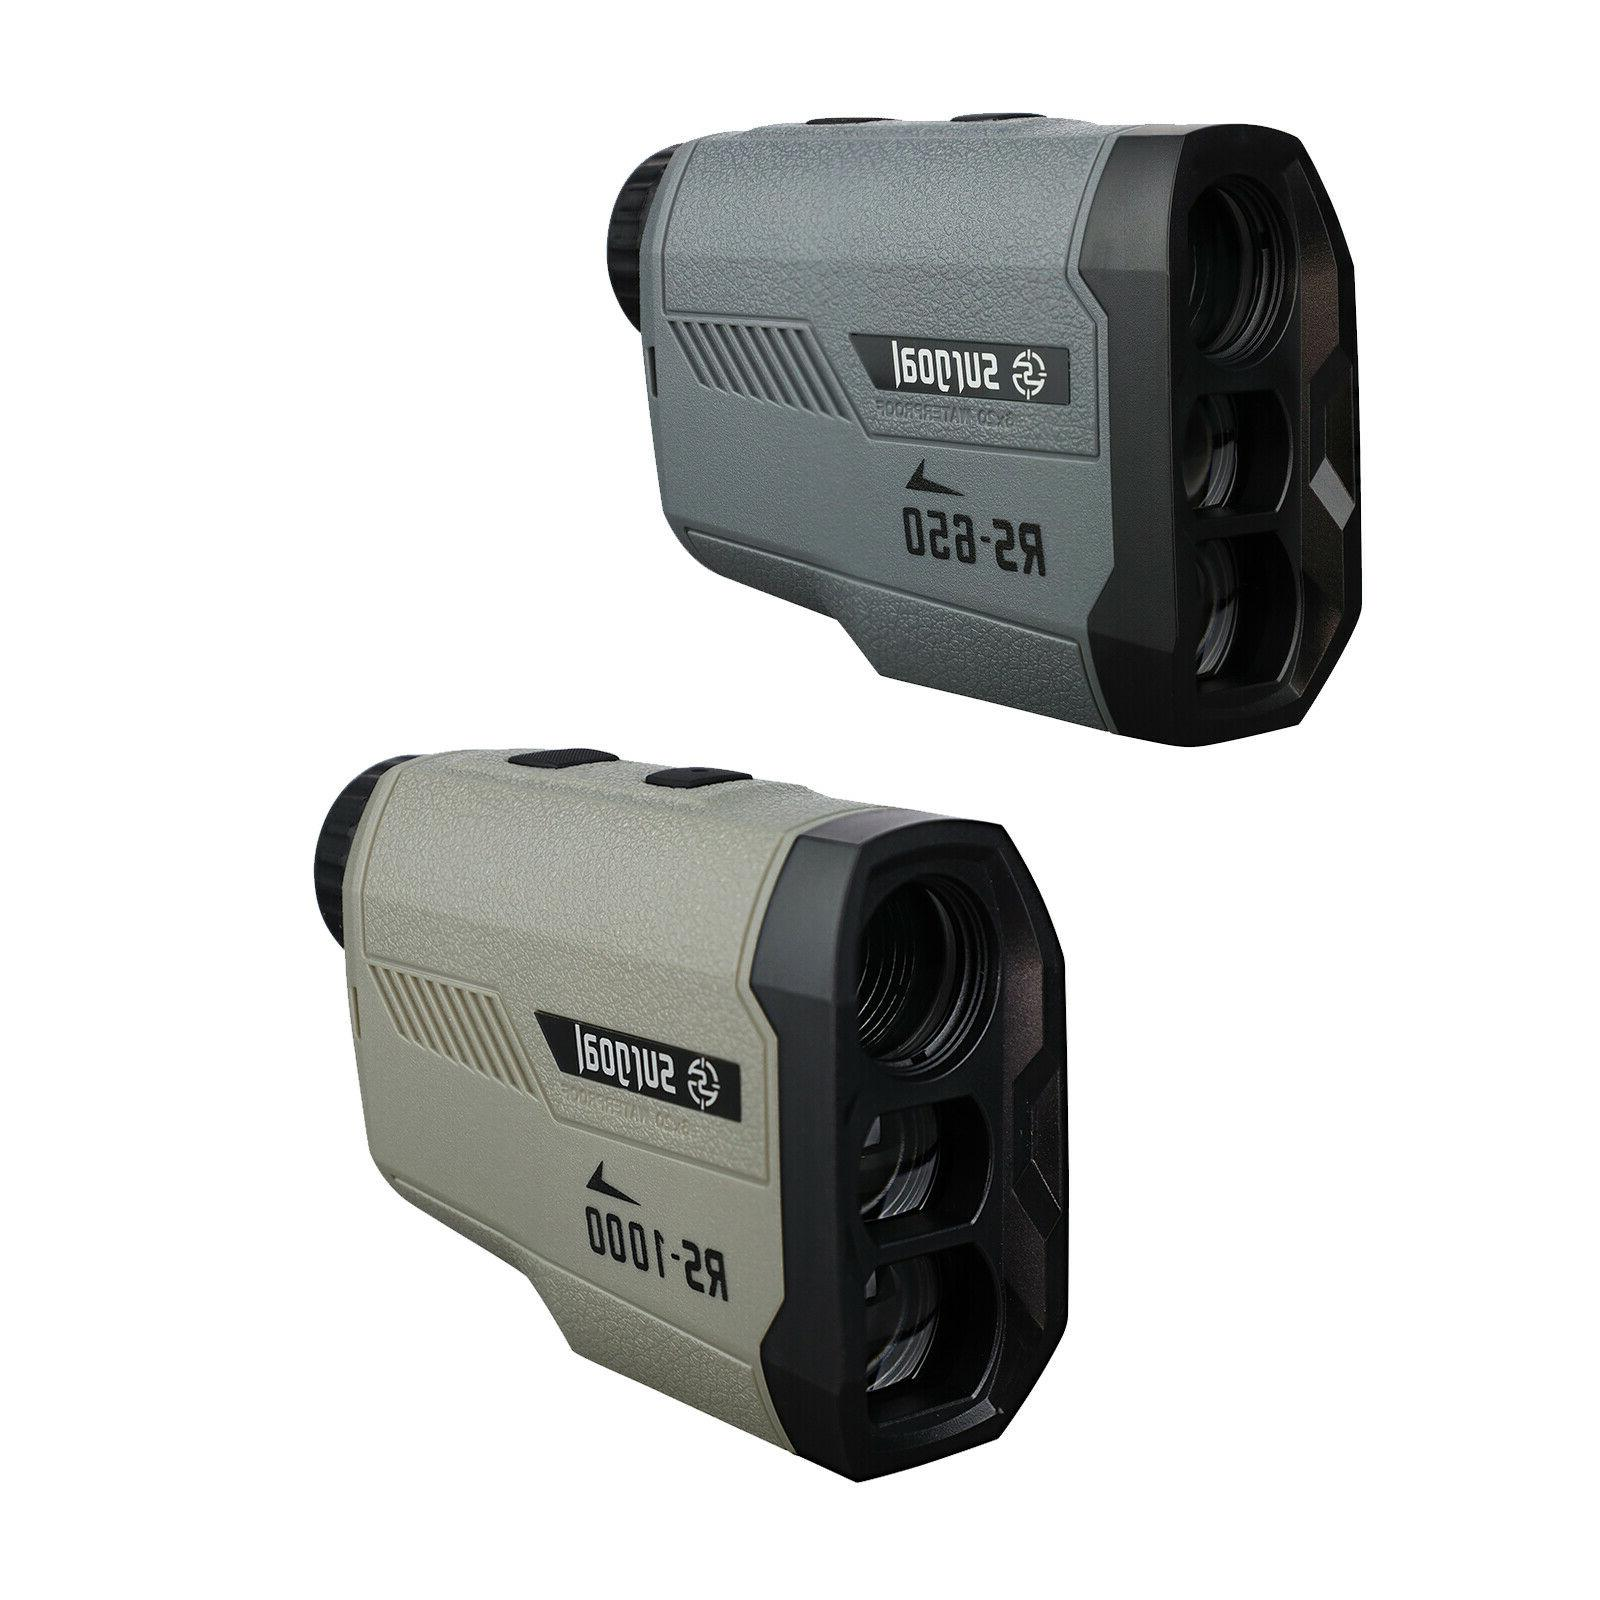 hd golf and hunting laser rangefinder 650yd